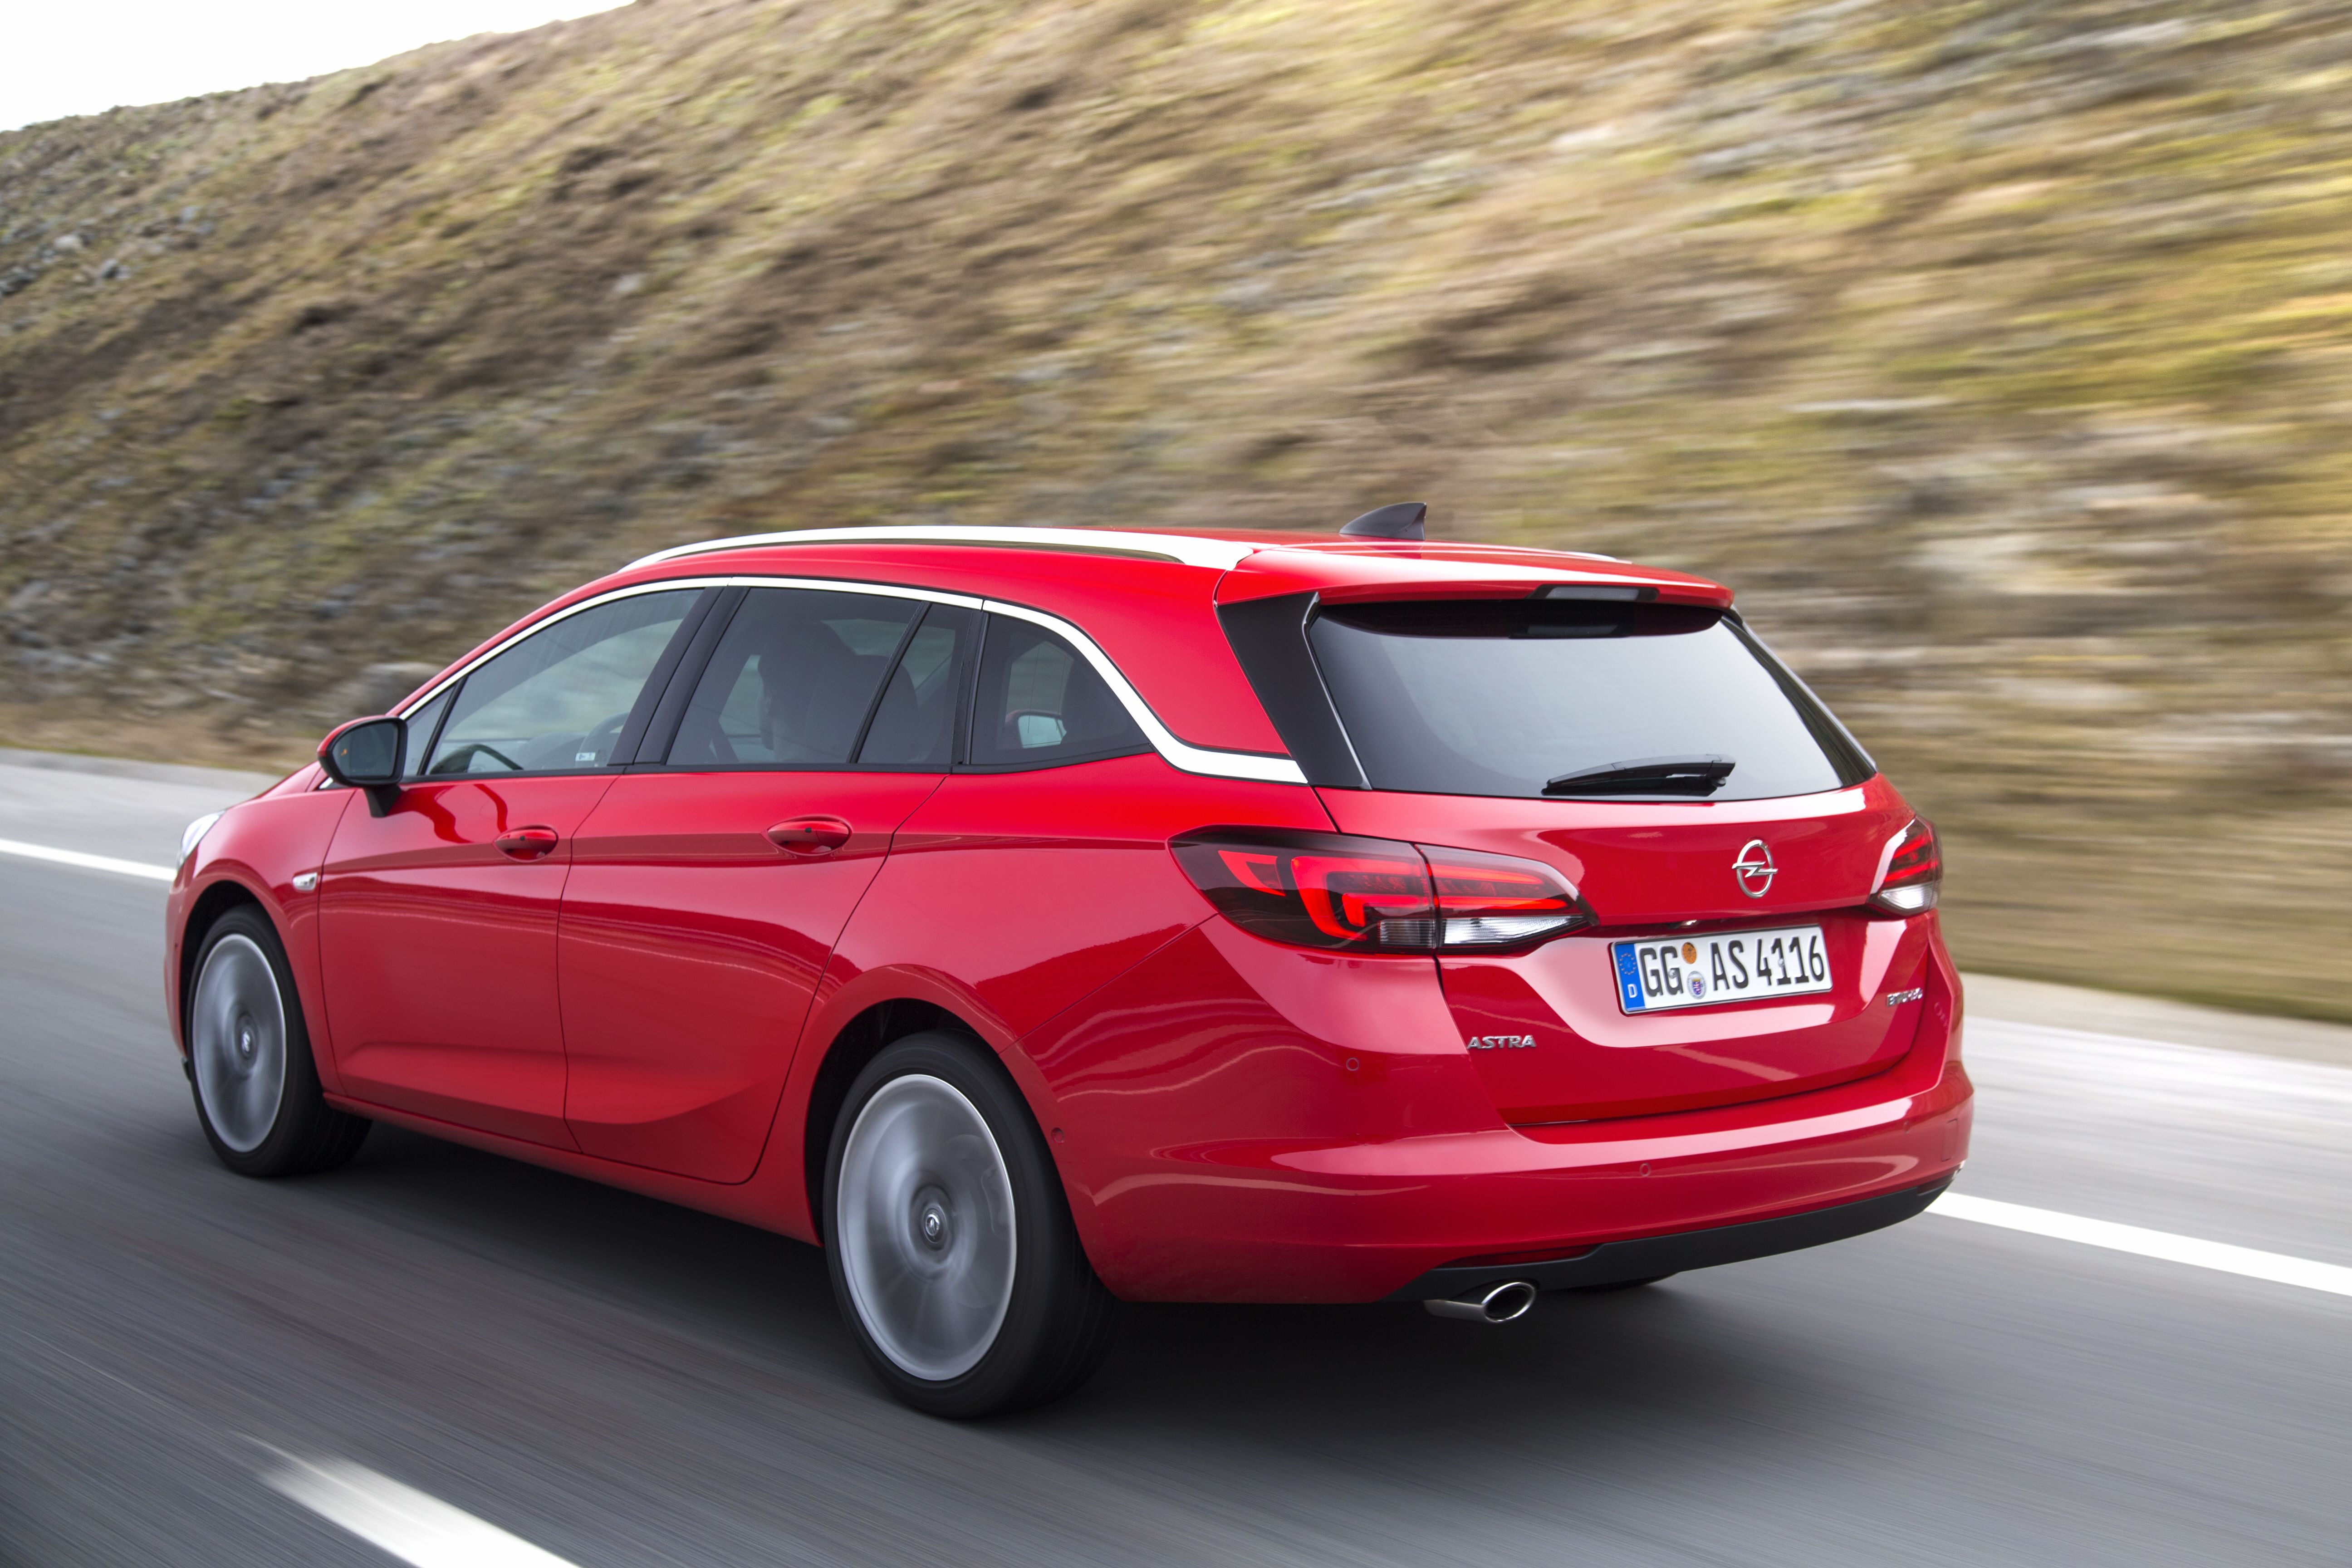 Opel Astra K Aktueller Opel Seit 2015 Limo Sports Tourer Preis Probleme Motoren Opel Astra K Opel Astra Tourer